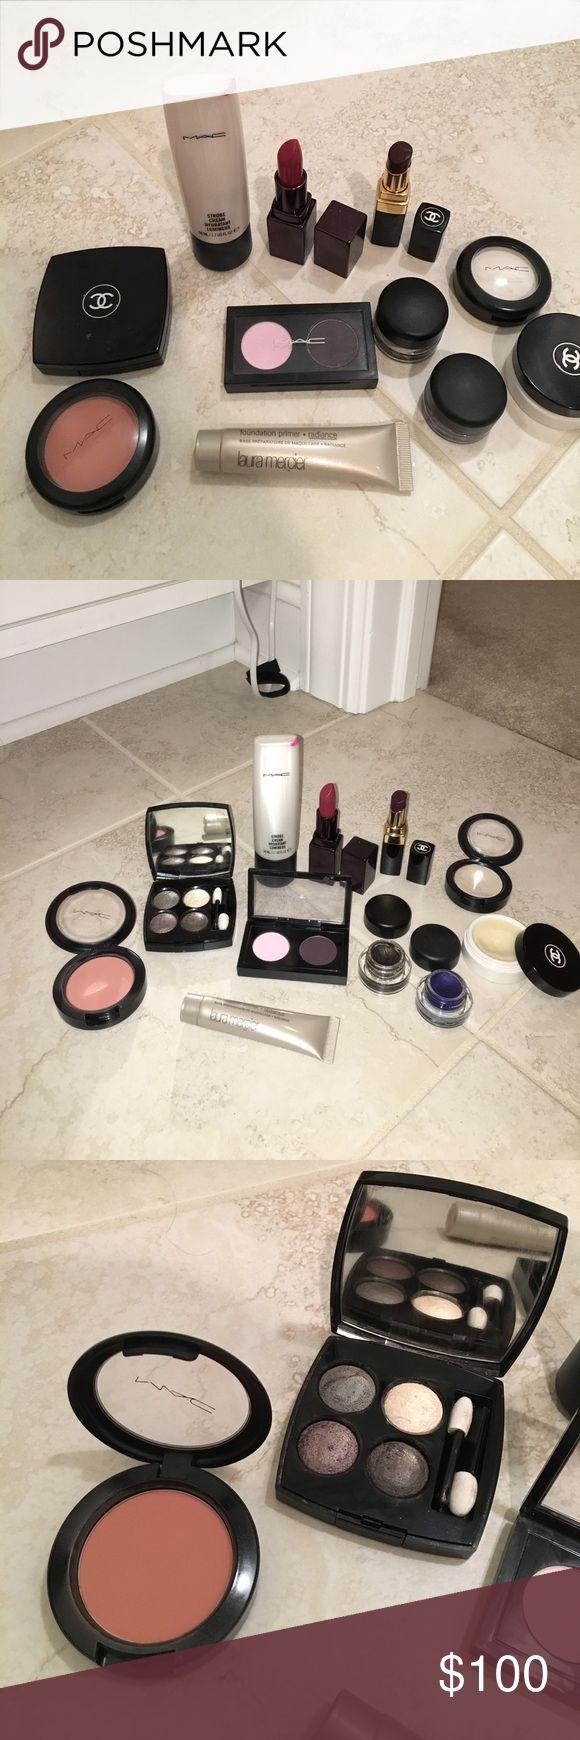 MAKEUP BUNDLE!!!!! Including MAC, CHANEL.. MAKEUP BUNDLE!!!!! Including MAC, CHANEL, Laura Mercier. Chanel les 4 ombres 208 tisse Gabrielle, Mac blush in melba, Laura Mercier foundation primer radiance, Mac eyeshadow duo, Mac strobe cream, Chanel lipstick in aura 96, Laura Mercier lipstick in Audrey. BLACK and BLUE Mac eye liner. And a Chanel hydra beauty lip care CHANEL Makeup